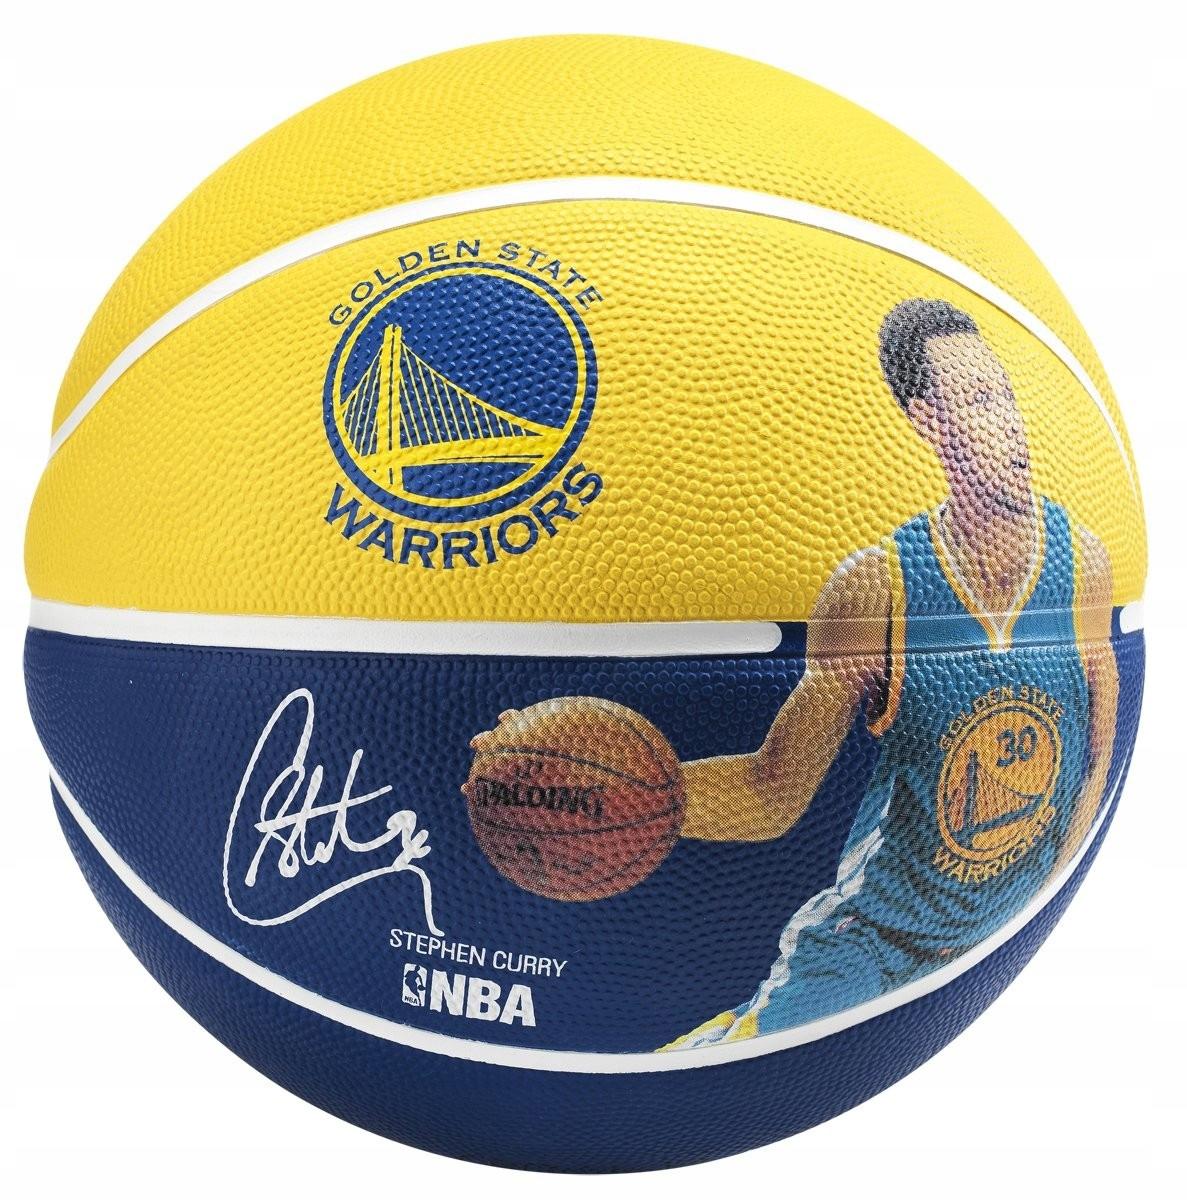 Lopta SPALDING NBA STEPHEN CURRY 7